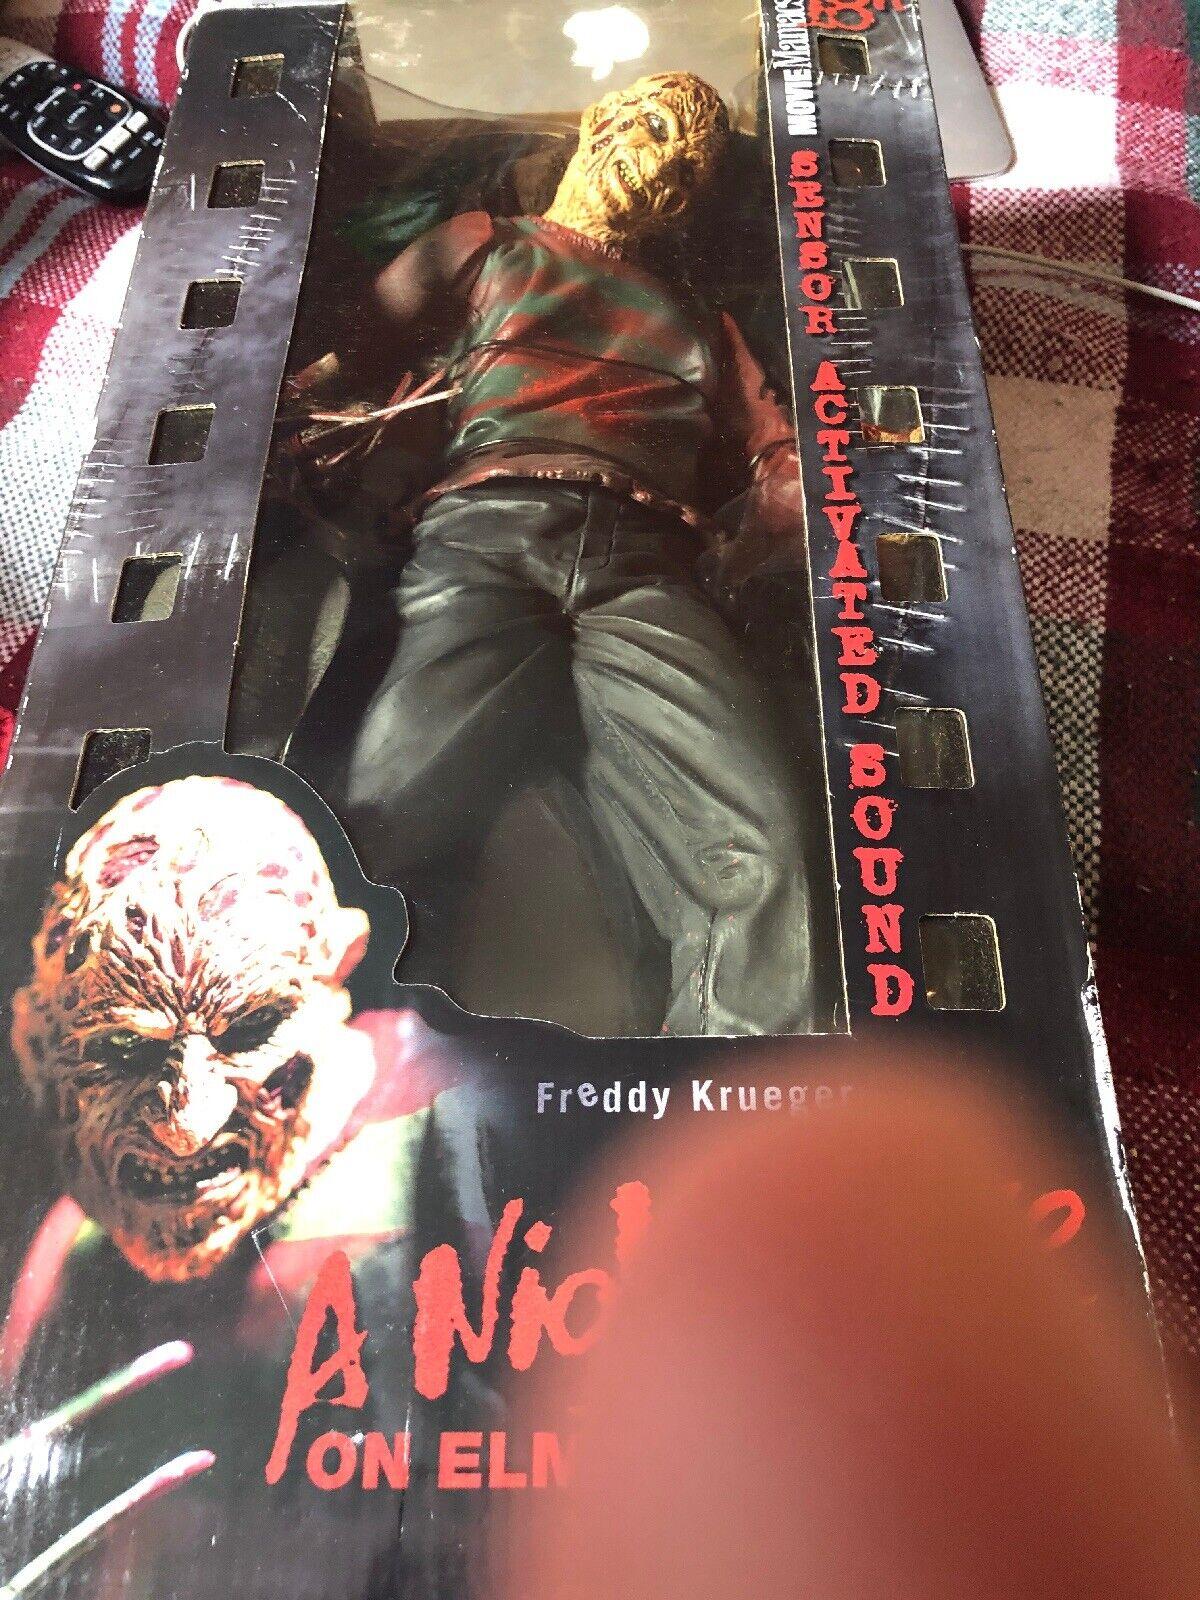 McFarlane giocattoli  Frossody  Krueger Movie uomoiacs 18  cifra  2000 Nightmare on Elm  molto popolare